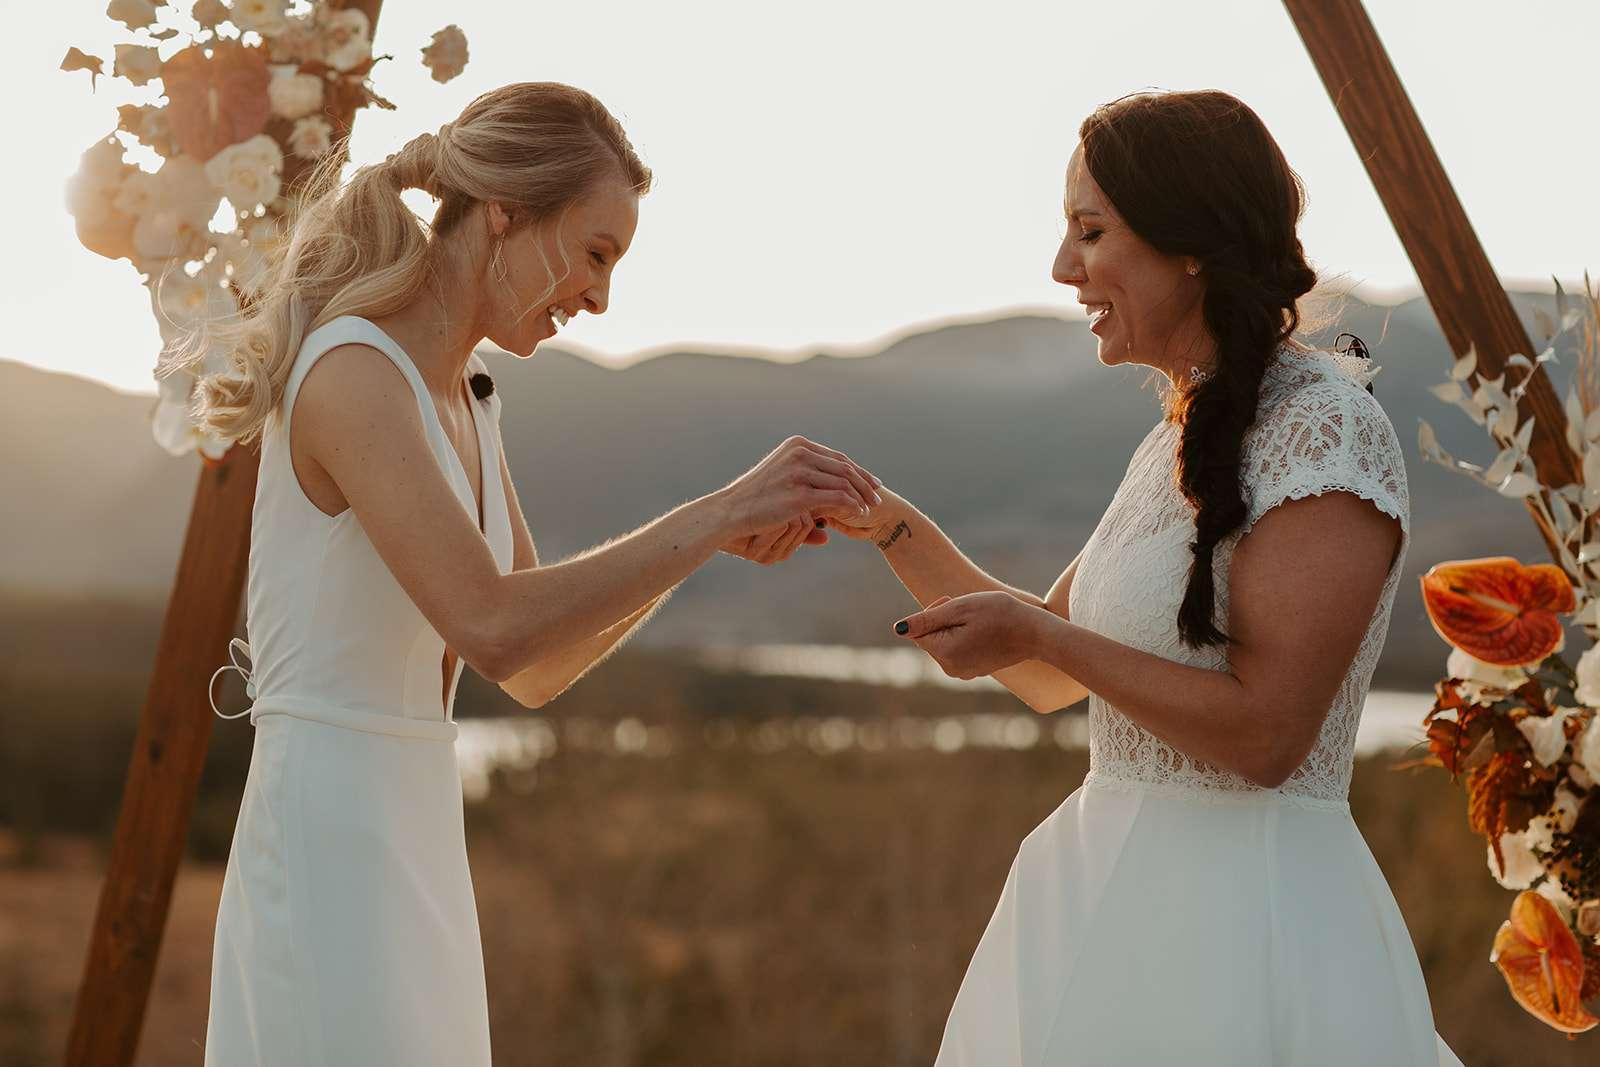 Brides exchange rings